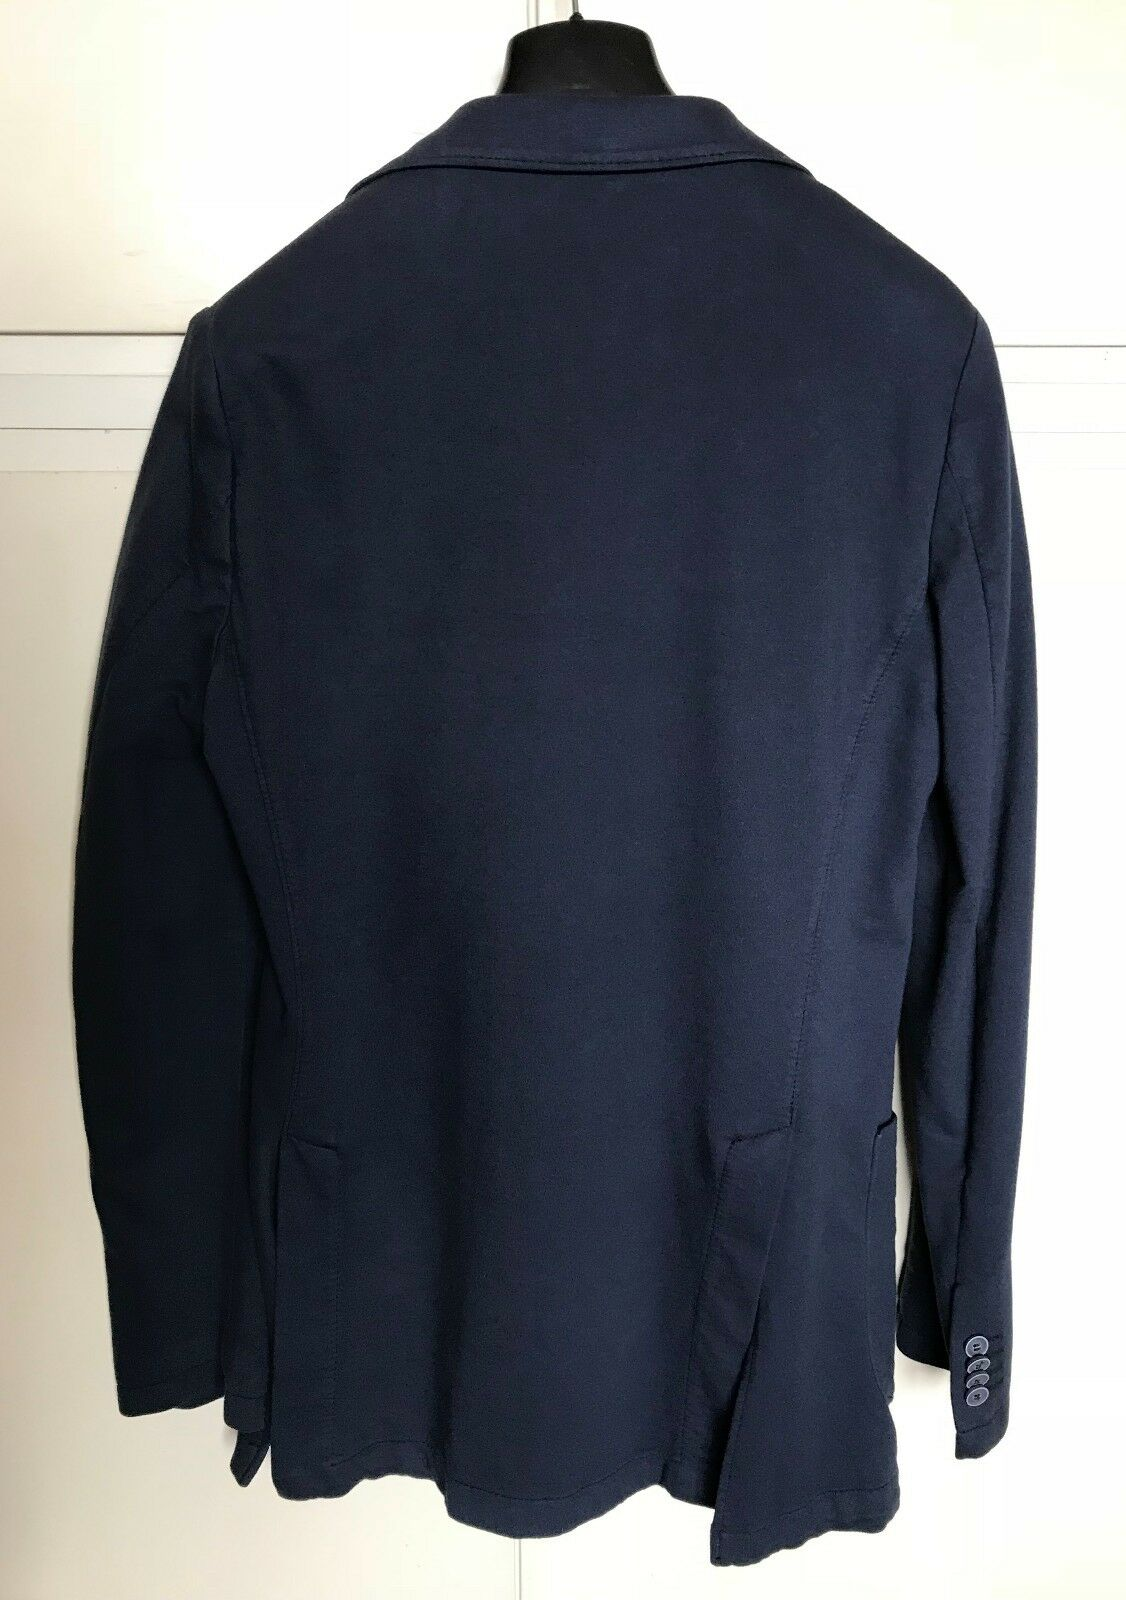 Giacca   blu in felpa RUMFORD 48 tg 48 RUMFORD blazer 1431a6